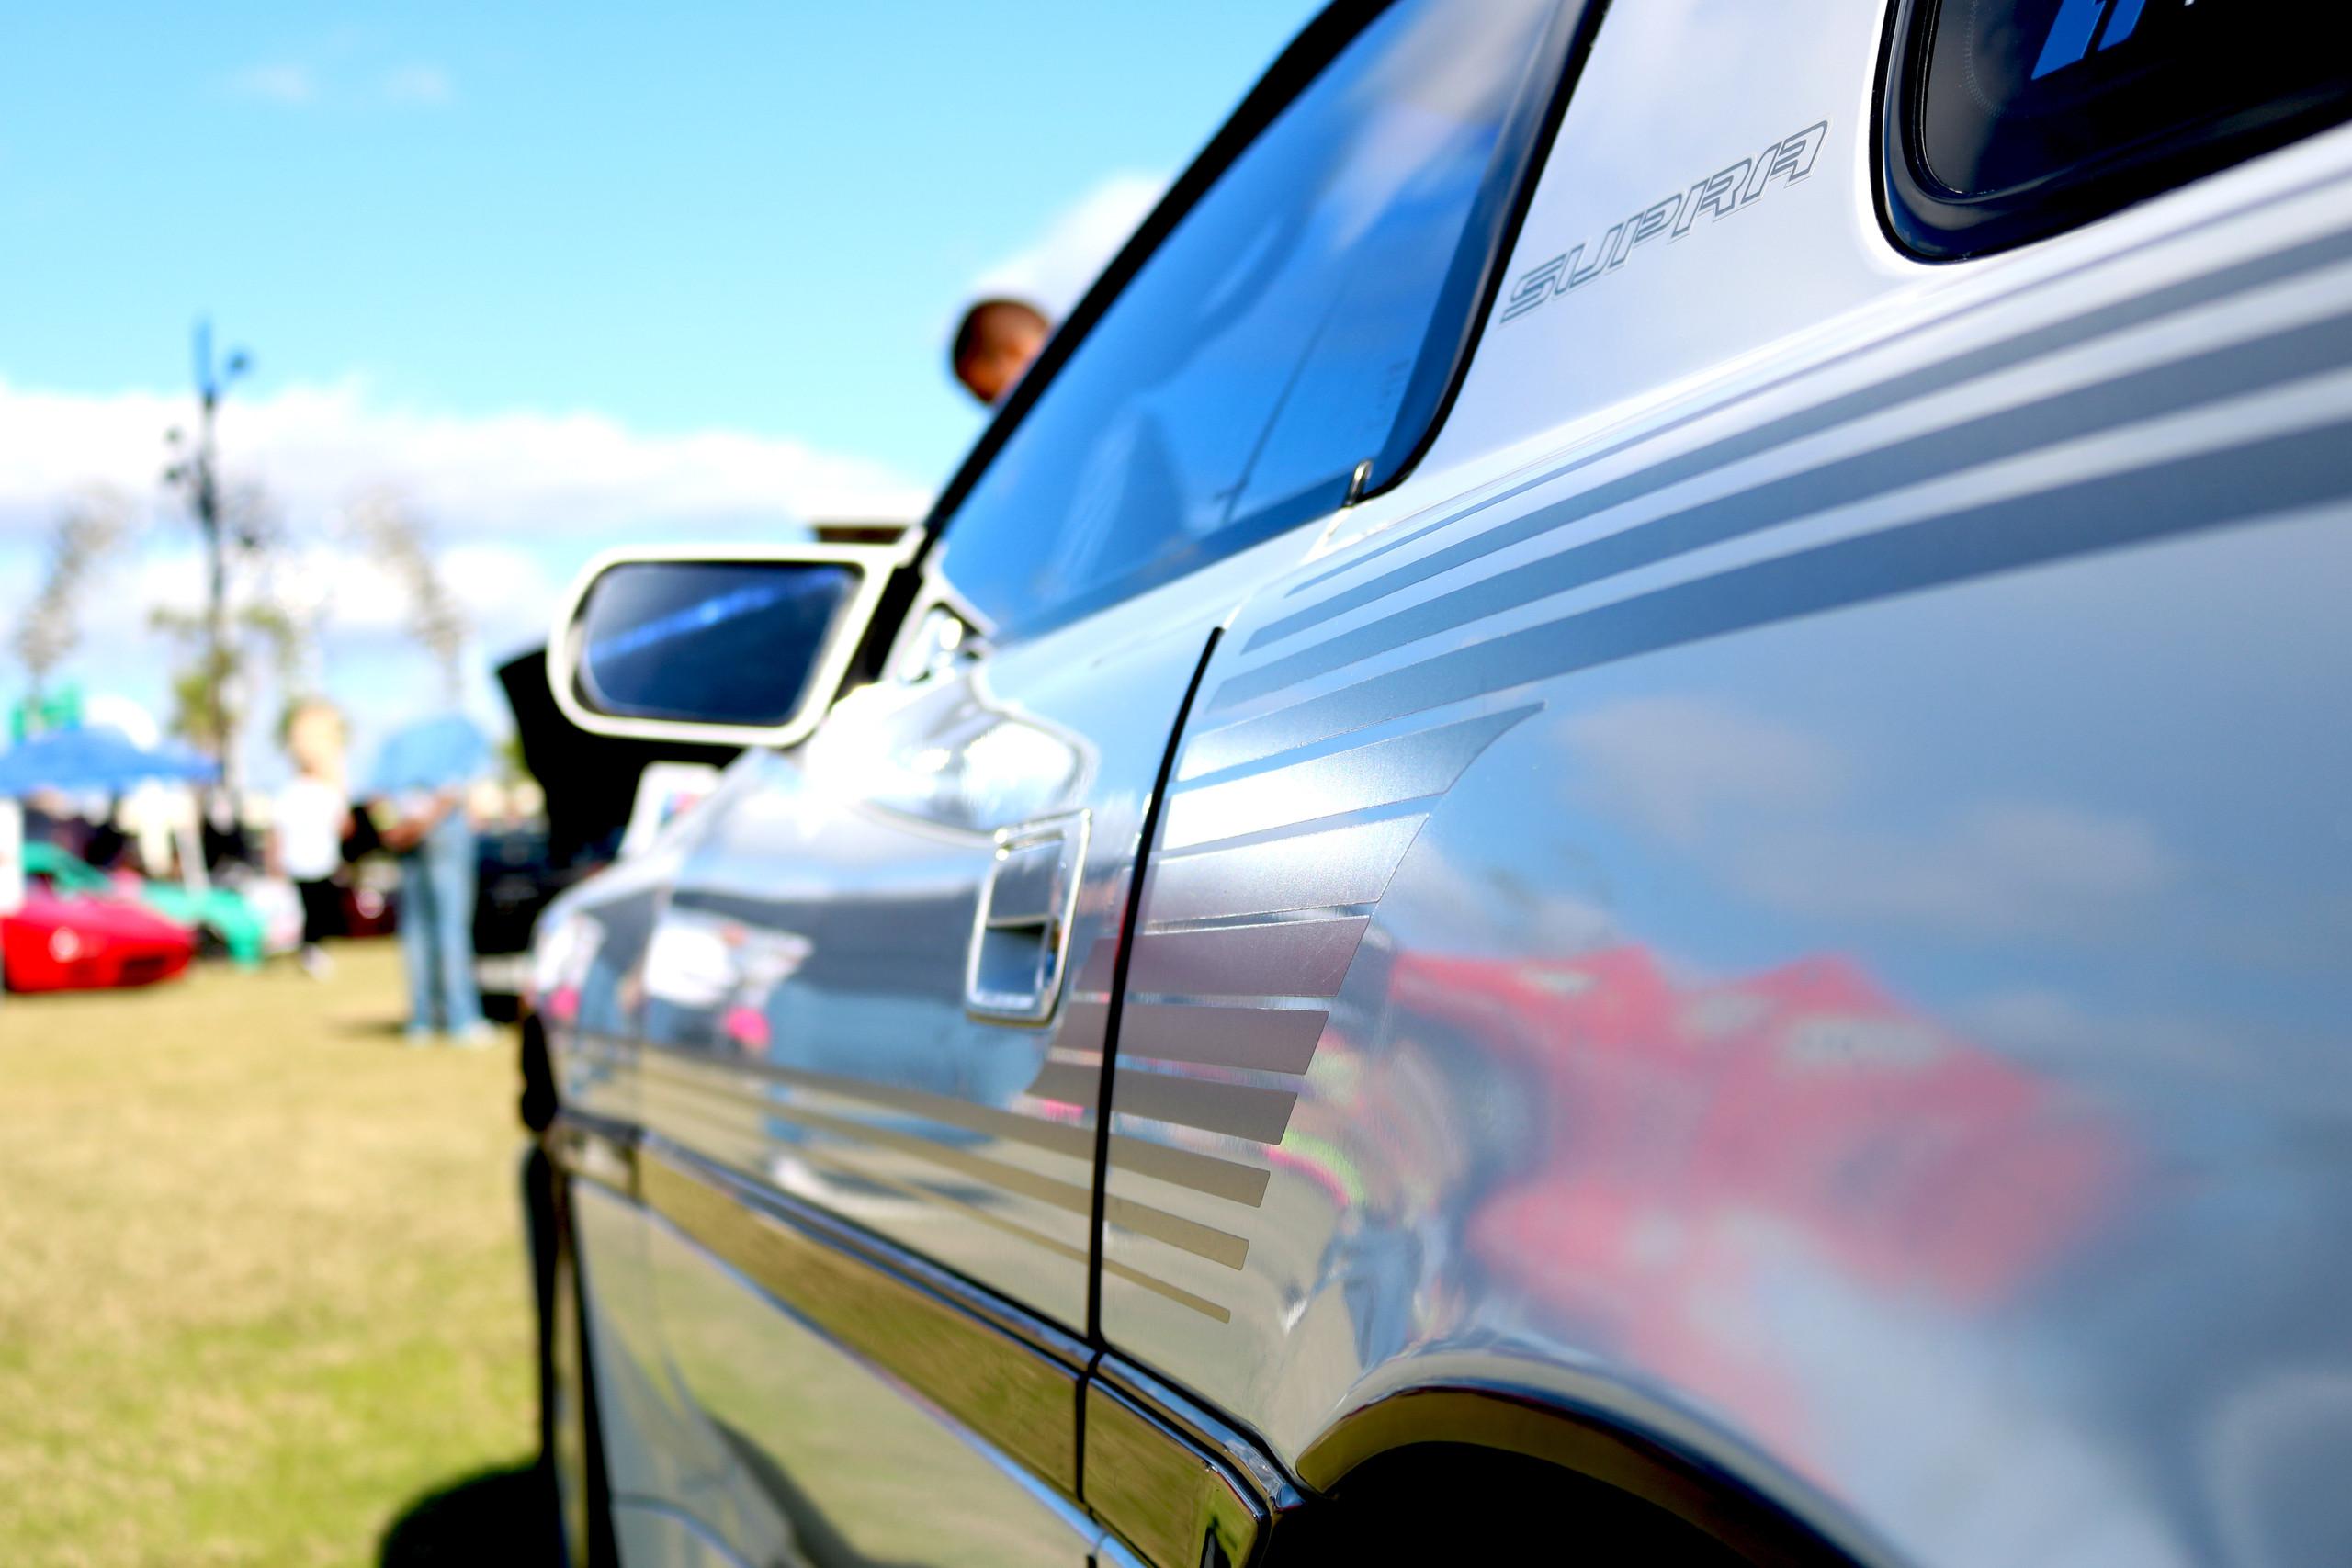 toyota,supra,7mge,7mgte,stock,classic,sports car,grand touring,gt,turbo,na,1jz,2jz,ma70